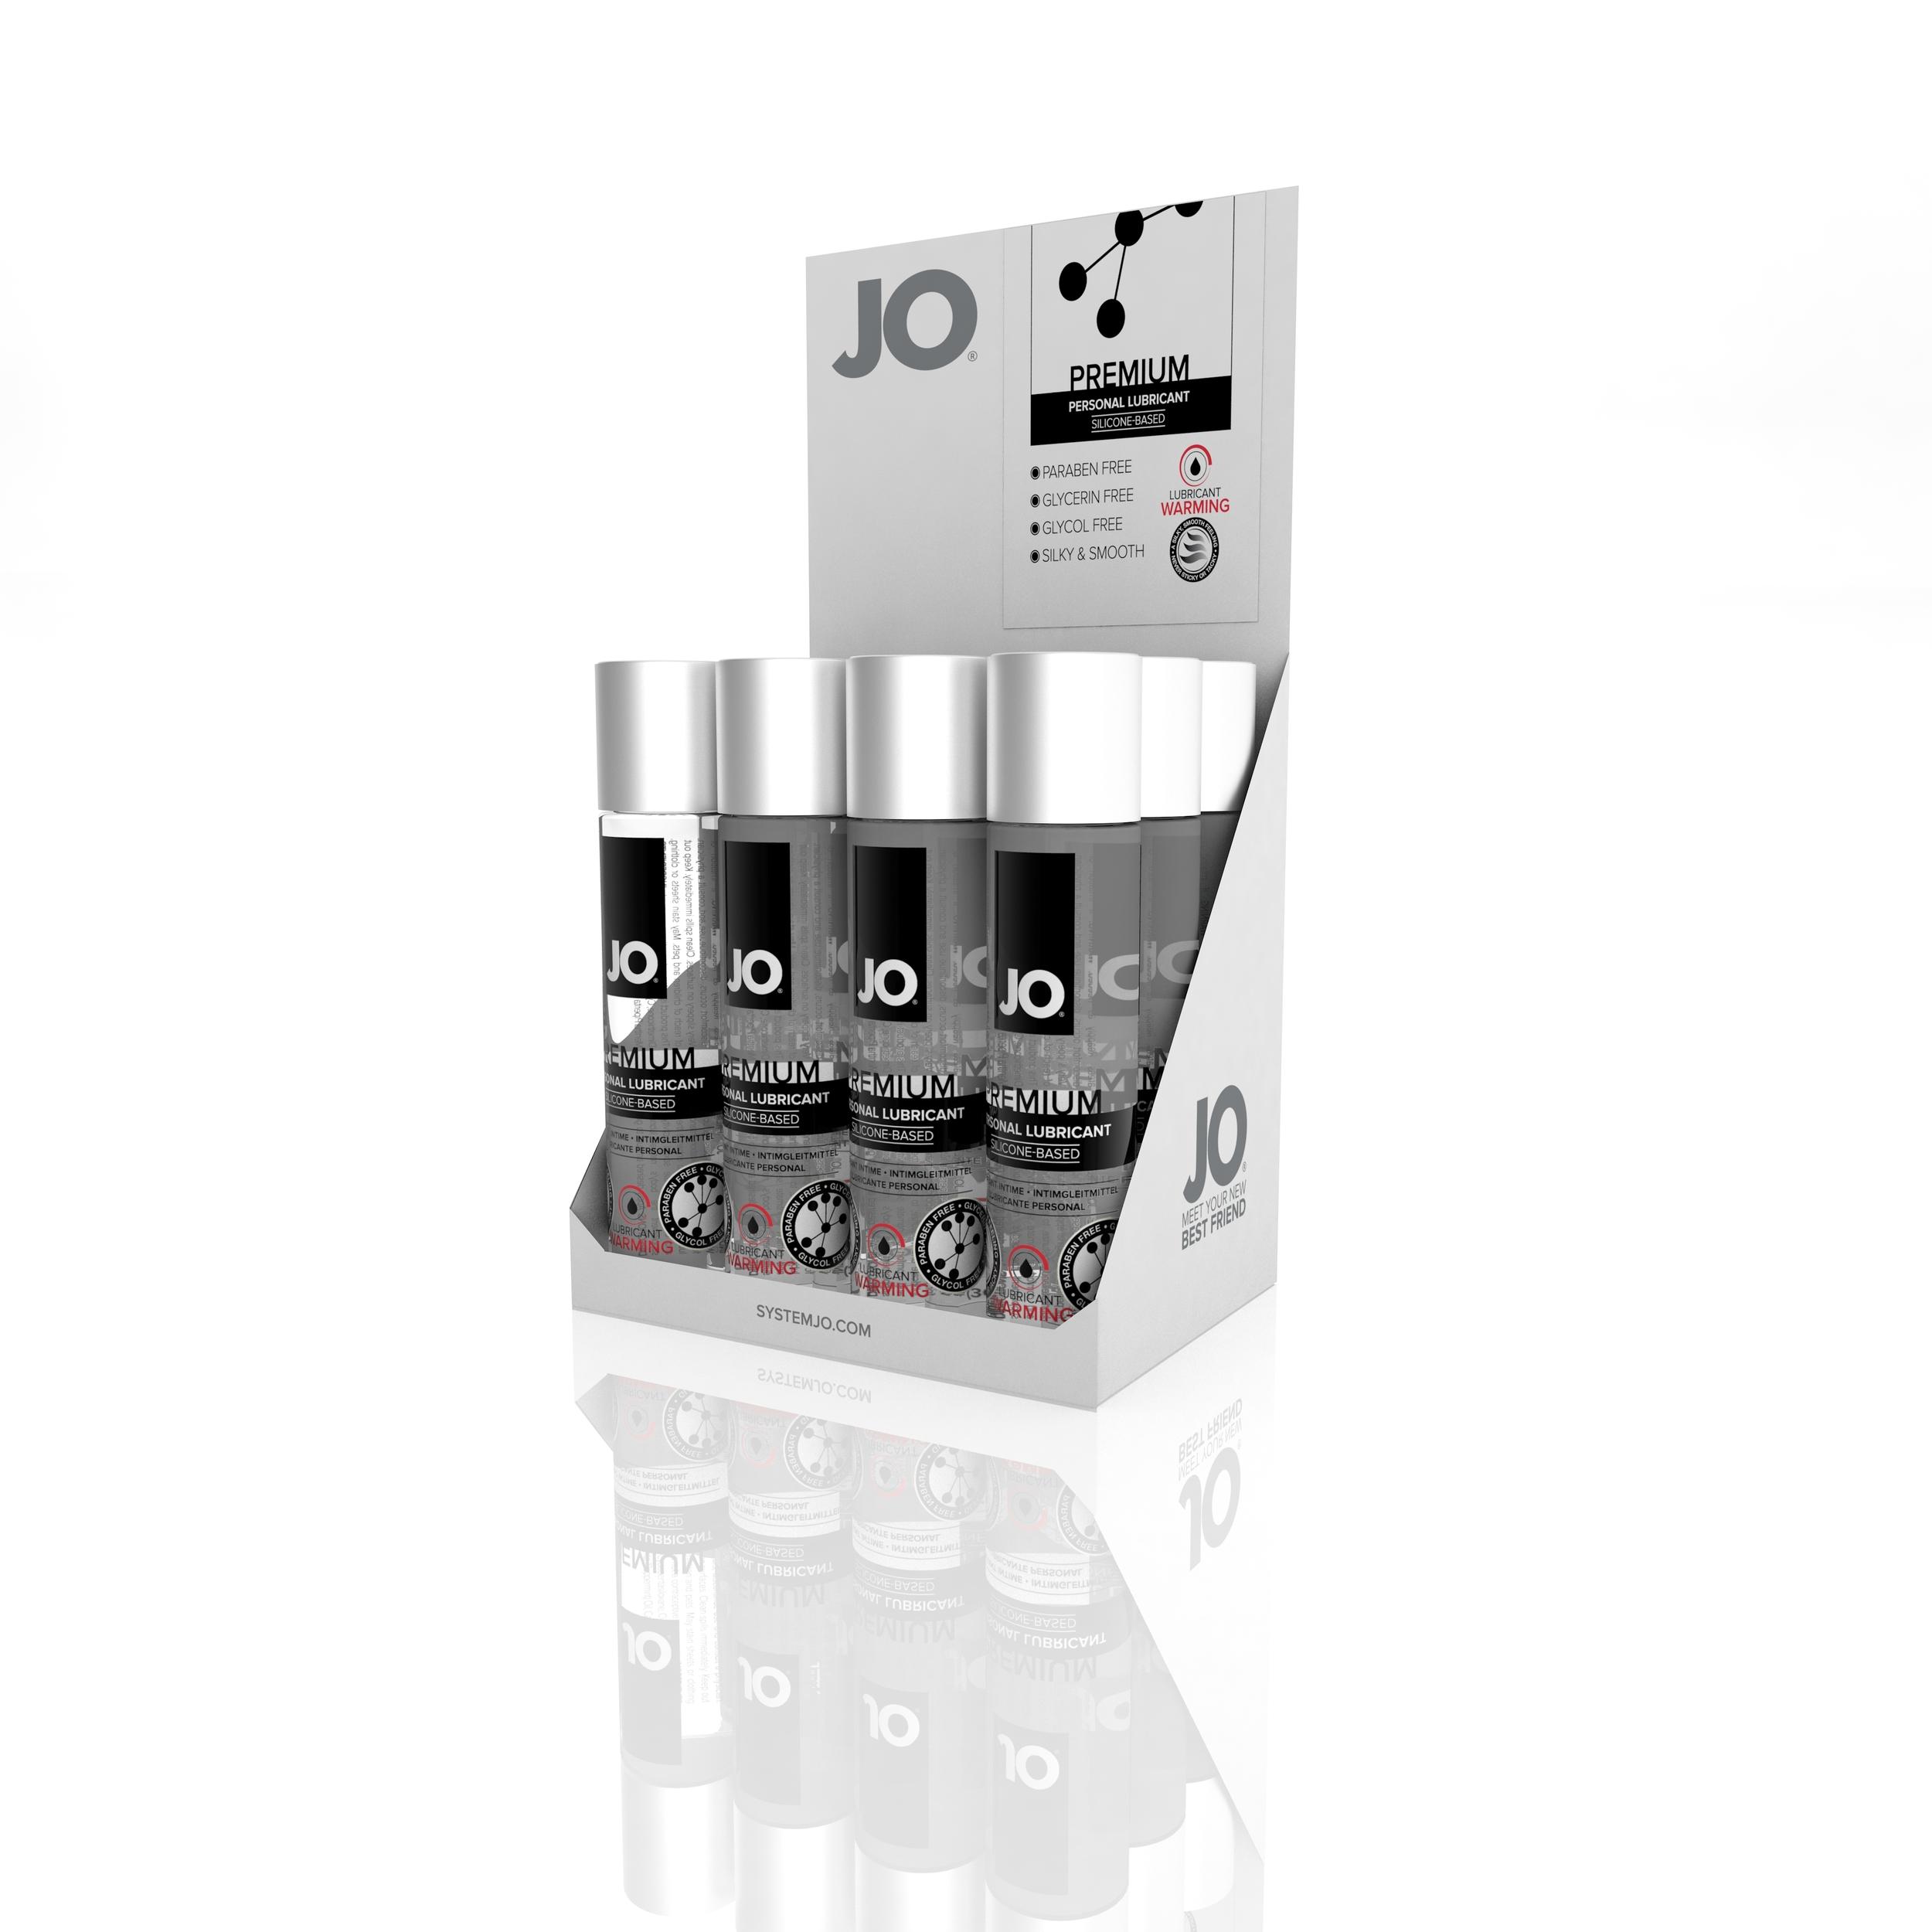 41065 - JO PREMIUM LUBRICANT - WARMING - 1fl.oz 30mL (MOQ 12 units - Includes Counter Display).jpg